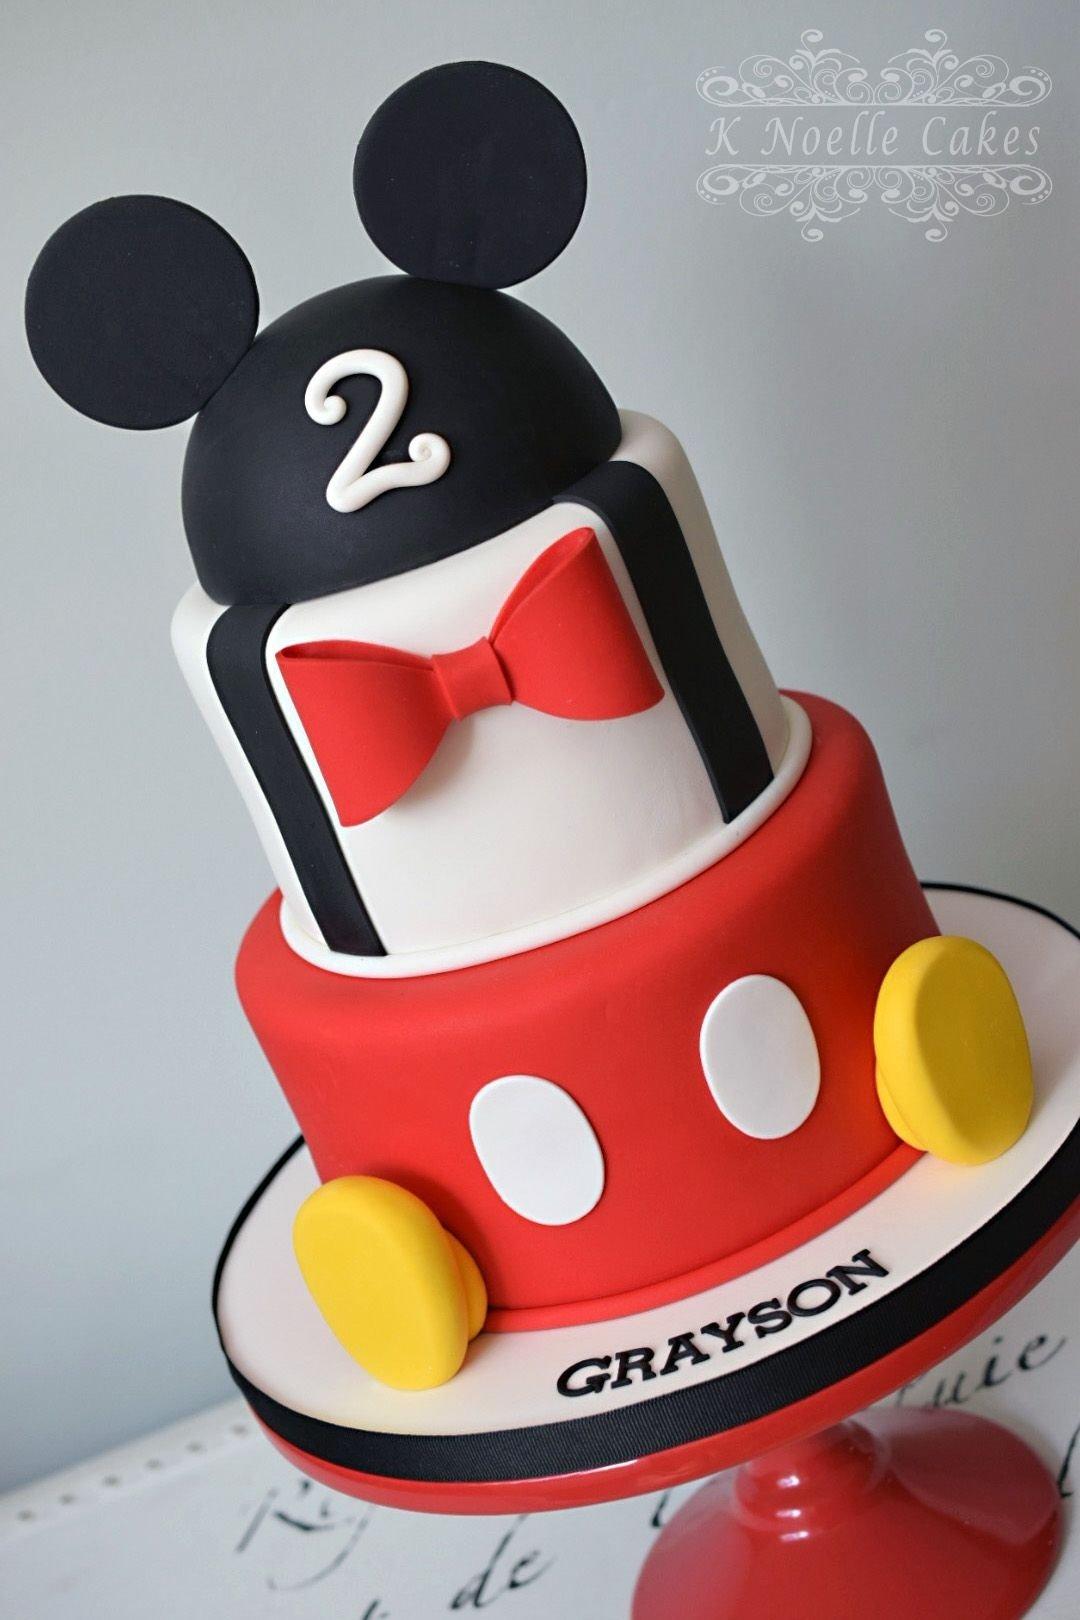 10 Most Popular Mickey Mouse Birthday Cake Ideas mickey mouse themed cakek noelle cakes disneys mickey minnie 2020